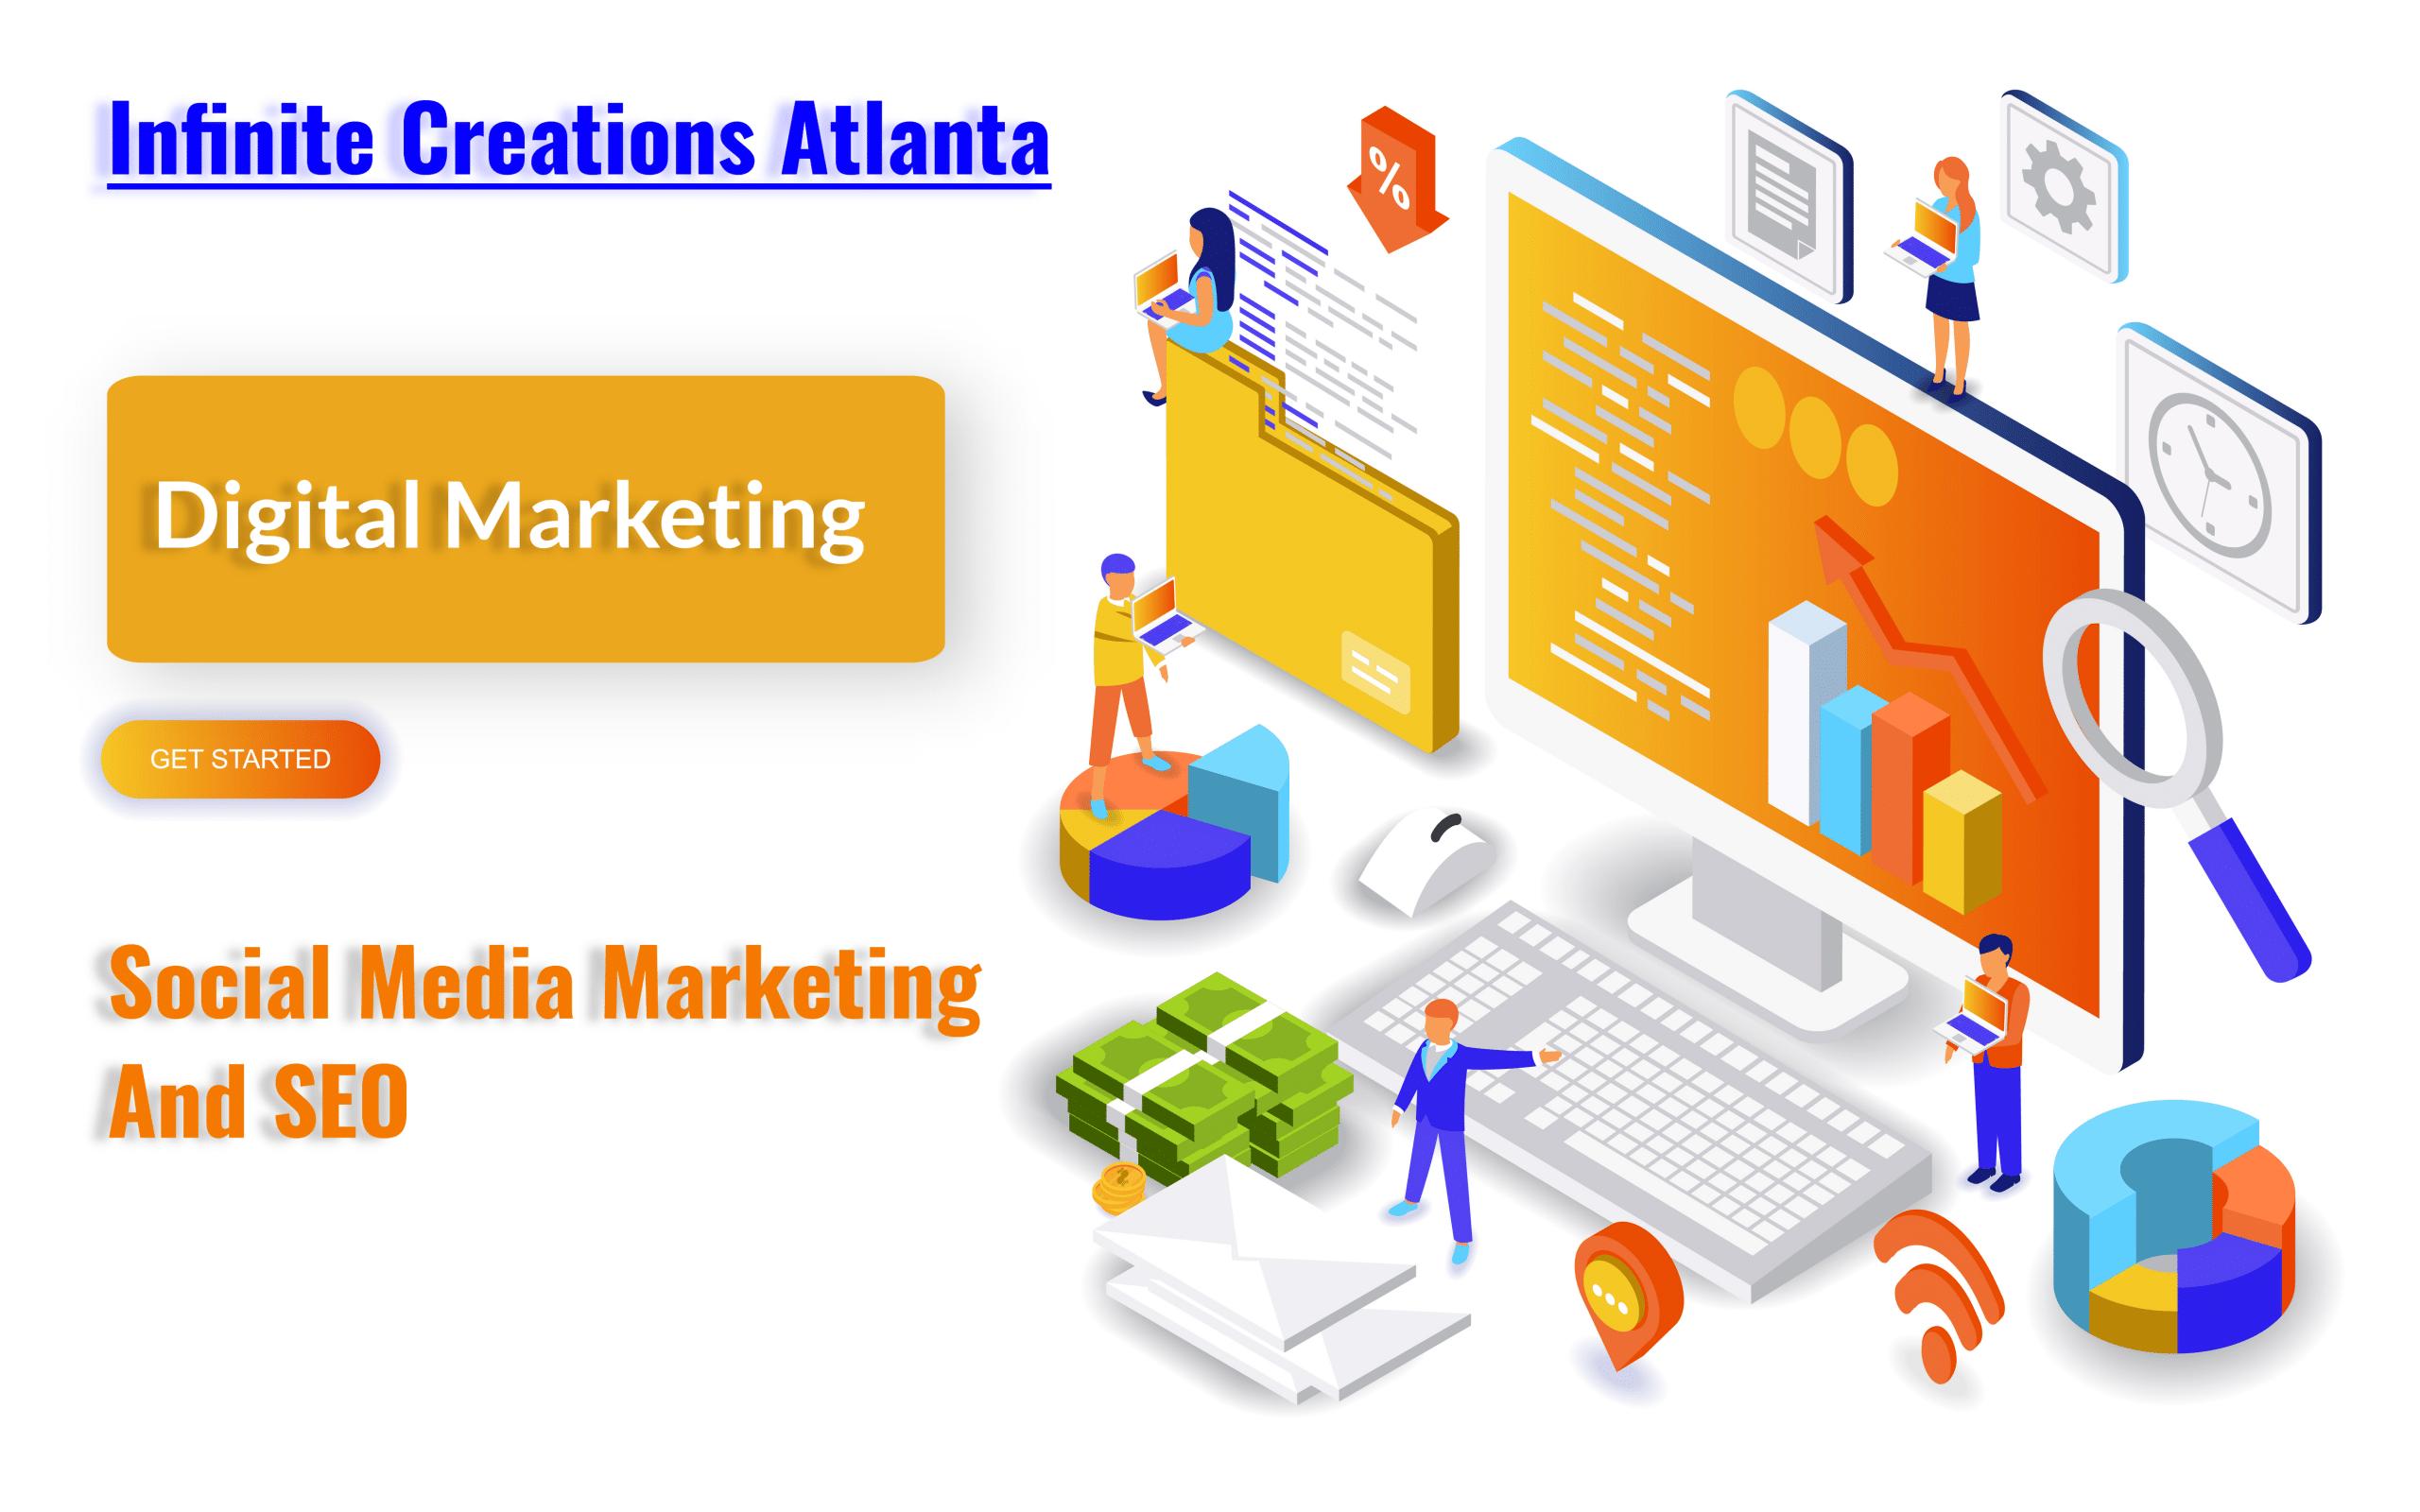 Infinite Creations Atlanta Digital Marketing News